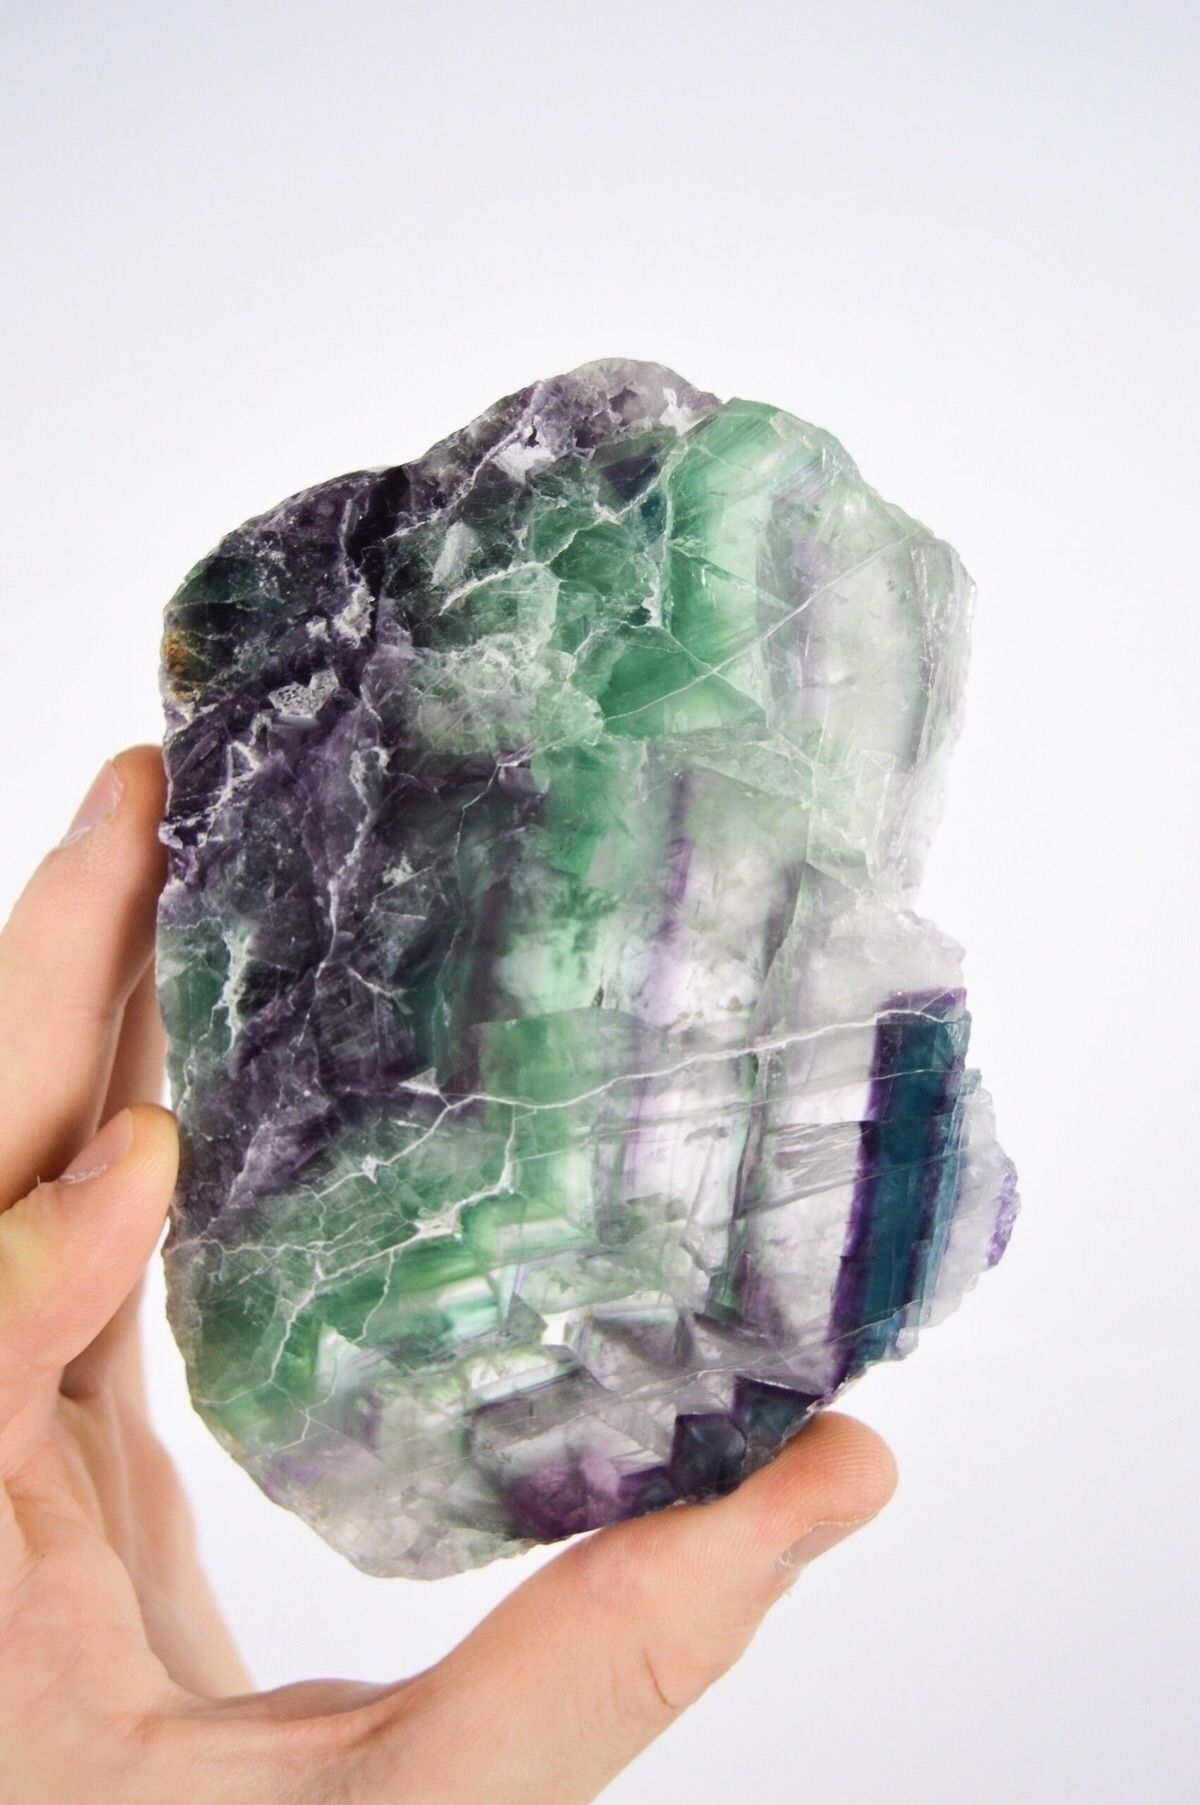 :green_heart::blue_heart::purpl - earthboundcrystals   ello